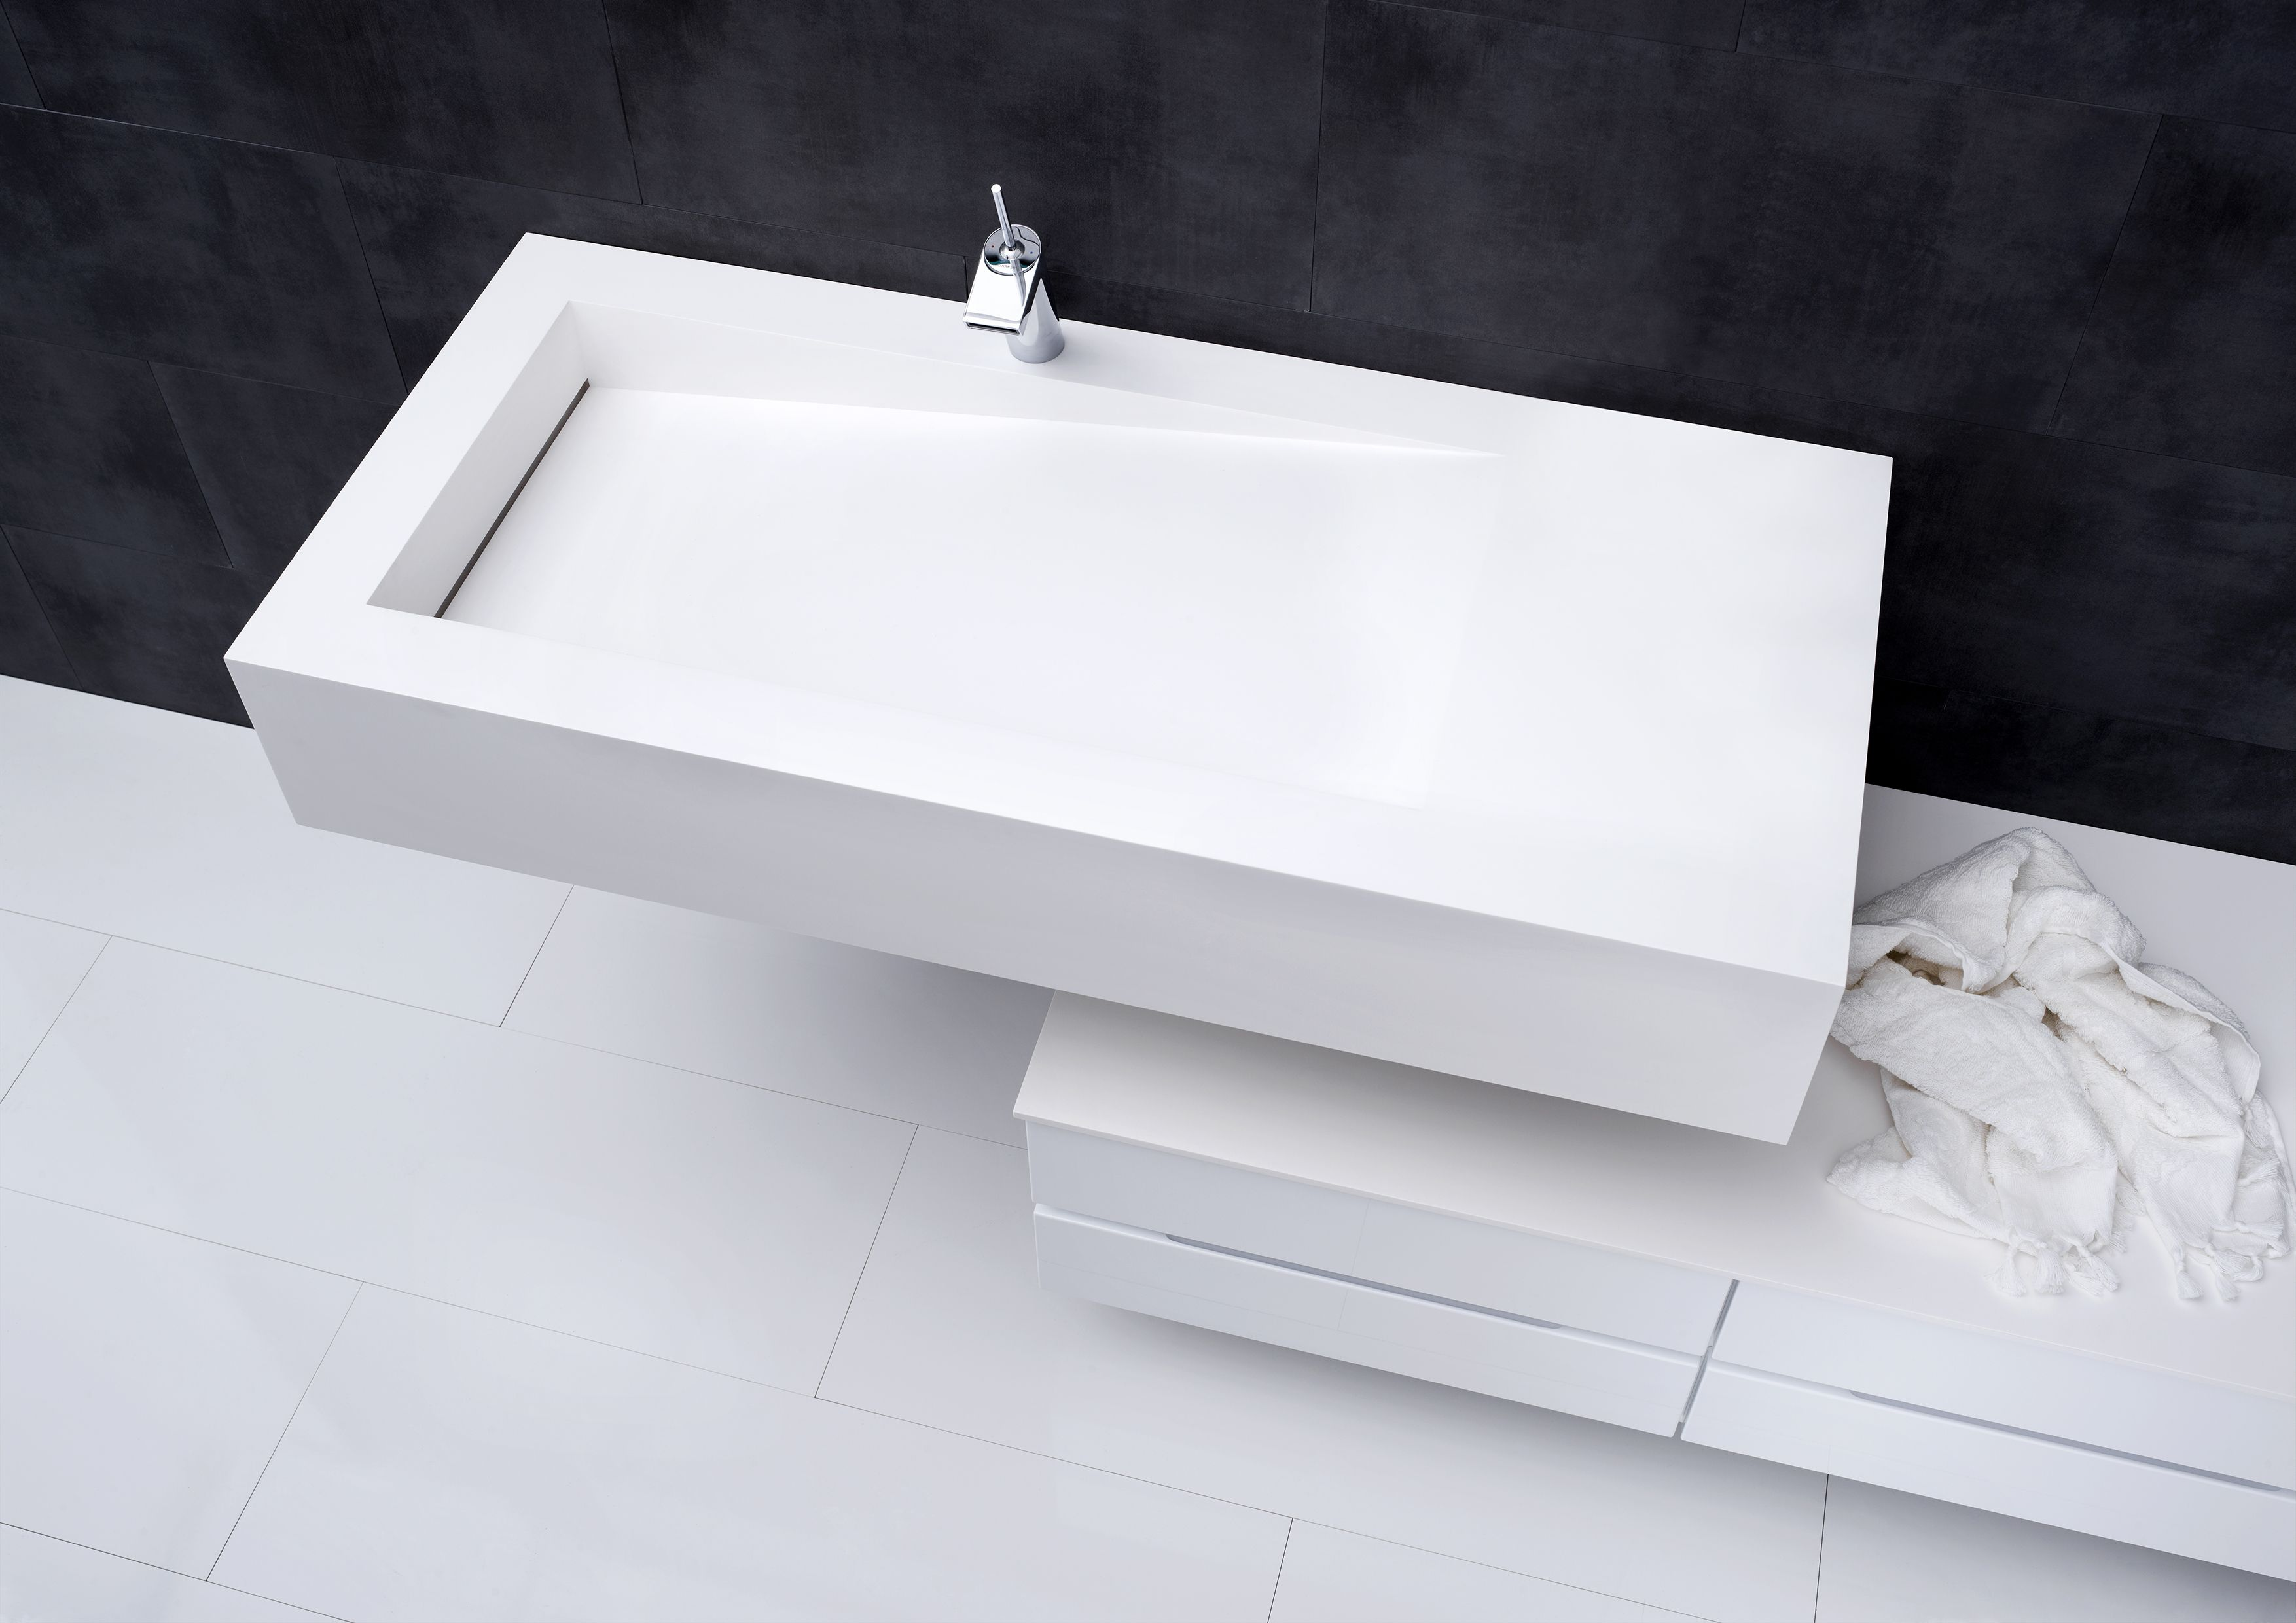 Square design sink from Kvik - Bath | Pinterest - Badkamer ...